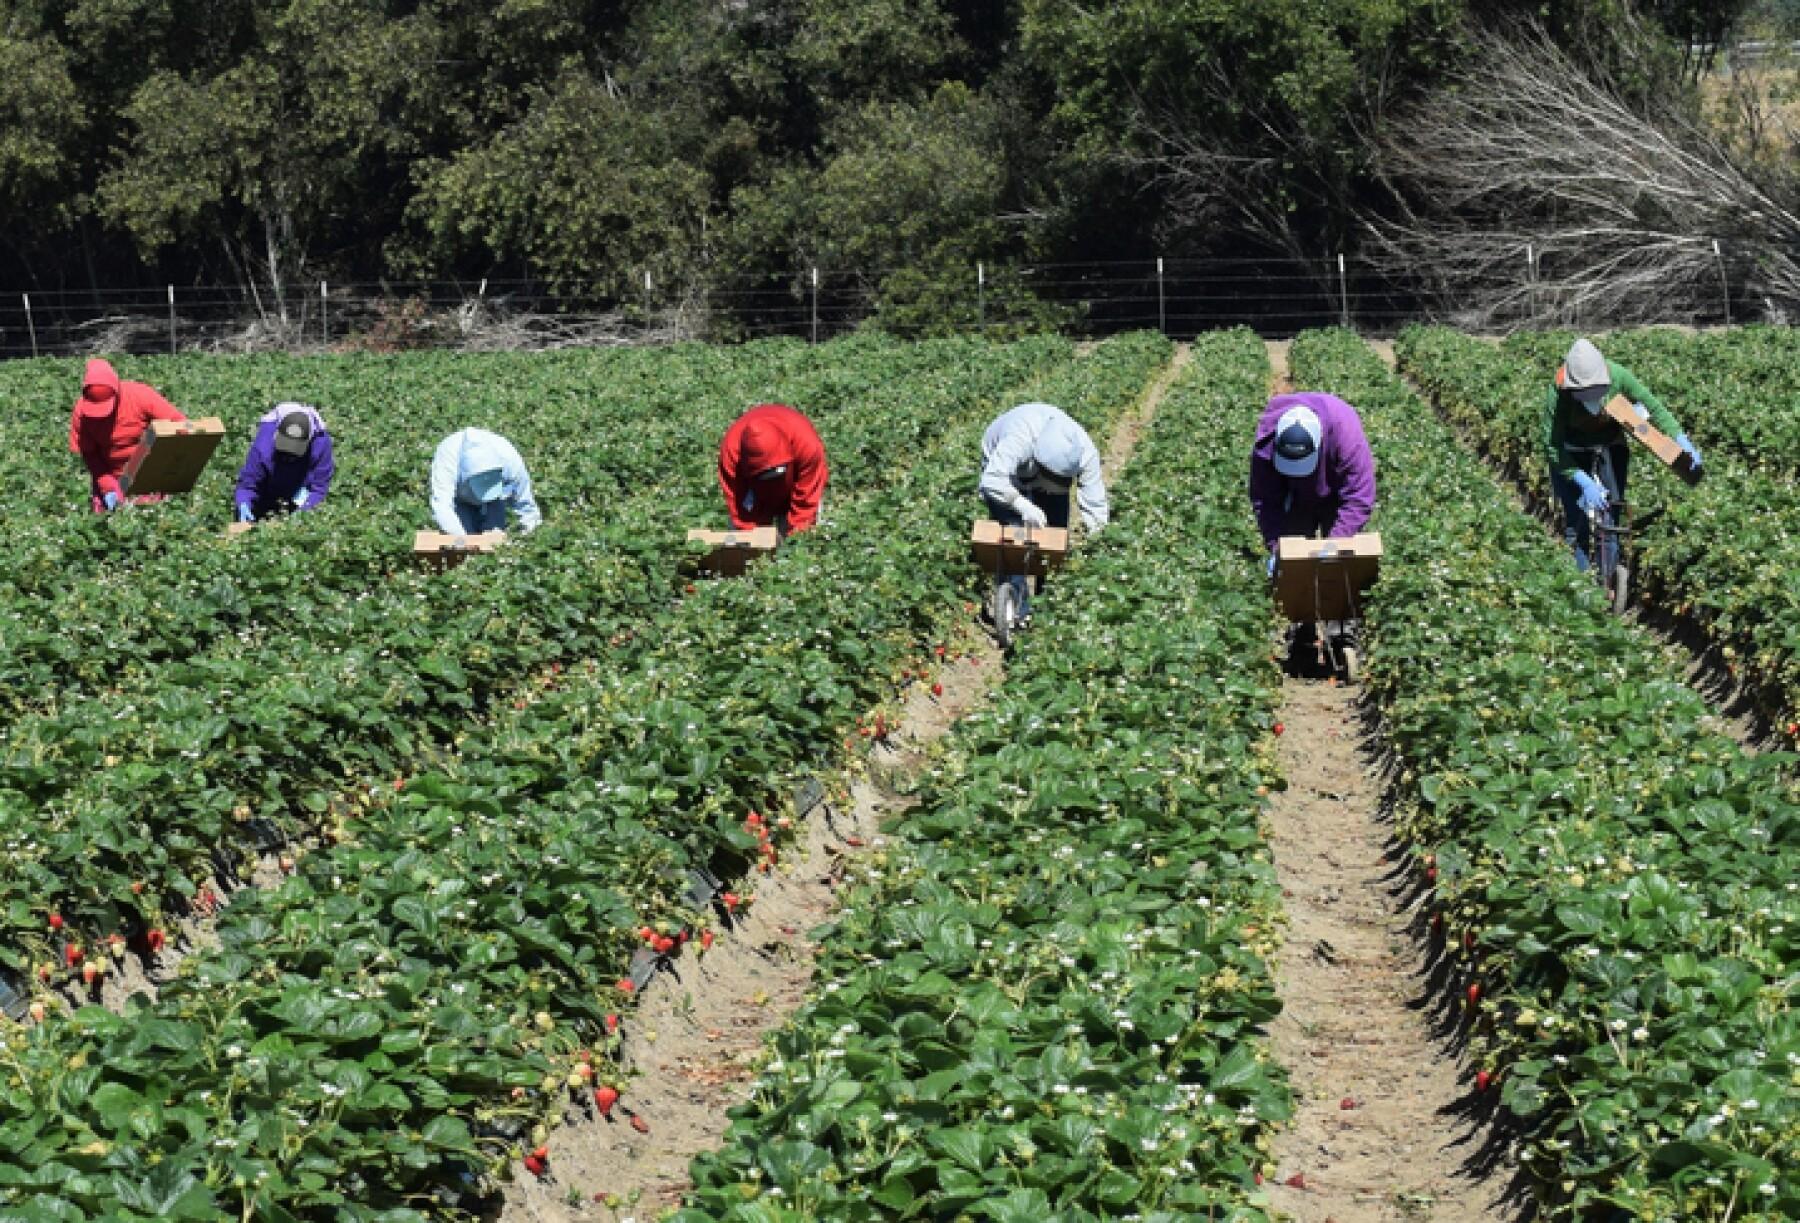 Strawberry Harvest in Central California